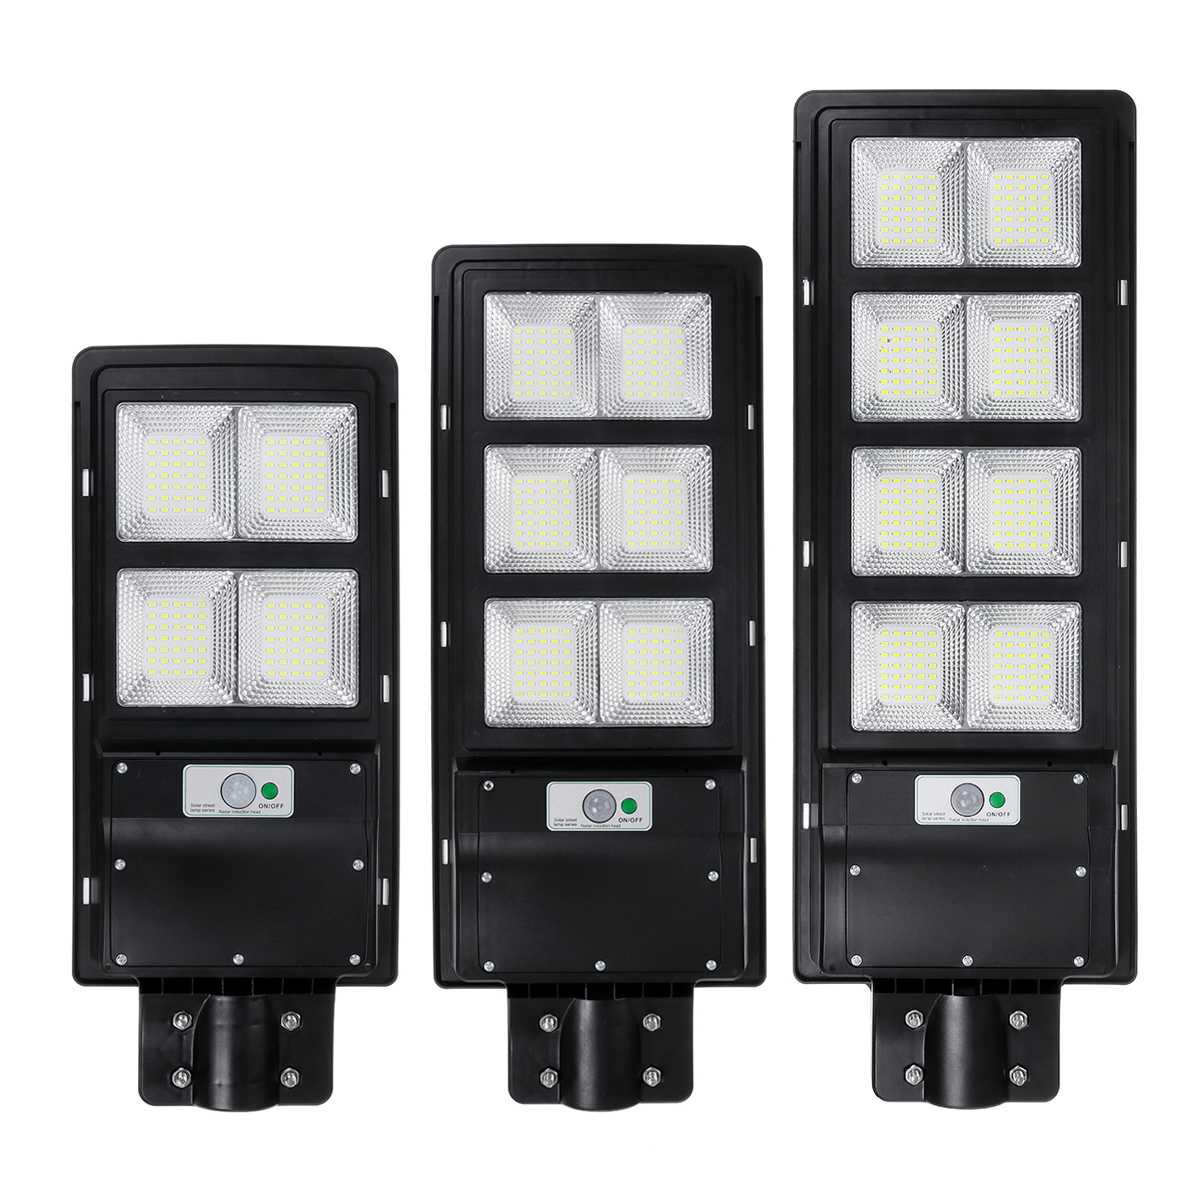 LED Solar Wall Lamp IP65 Street Light Radar Motion 2 In 1 Constantly Bright Solar Sensor Timming Control Lamp 300W 600W 900W